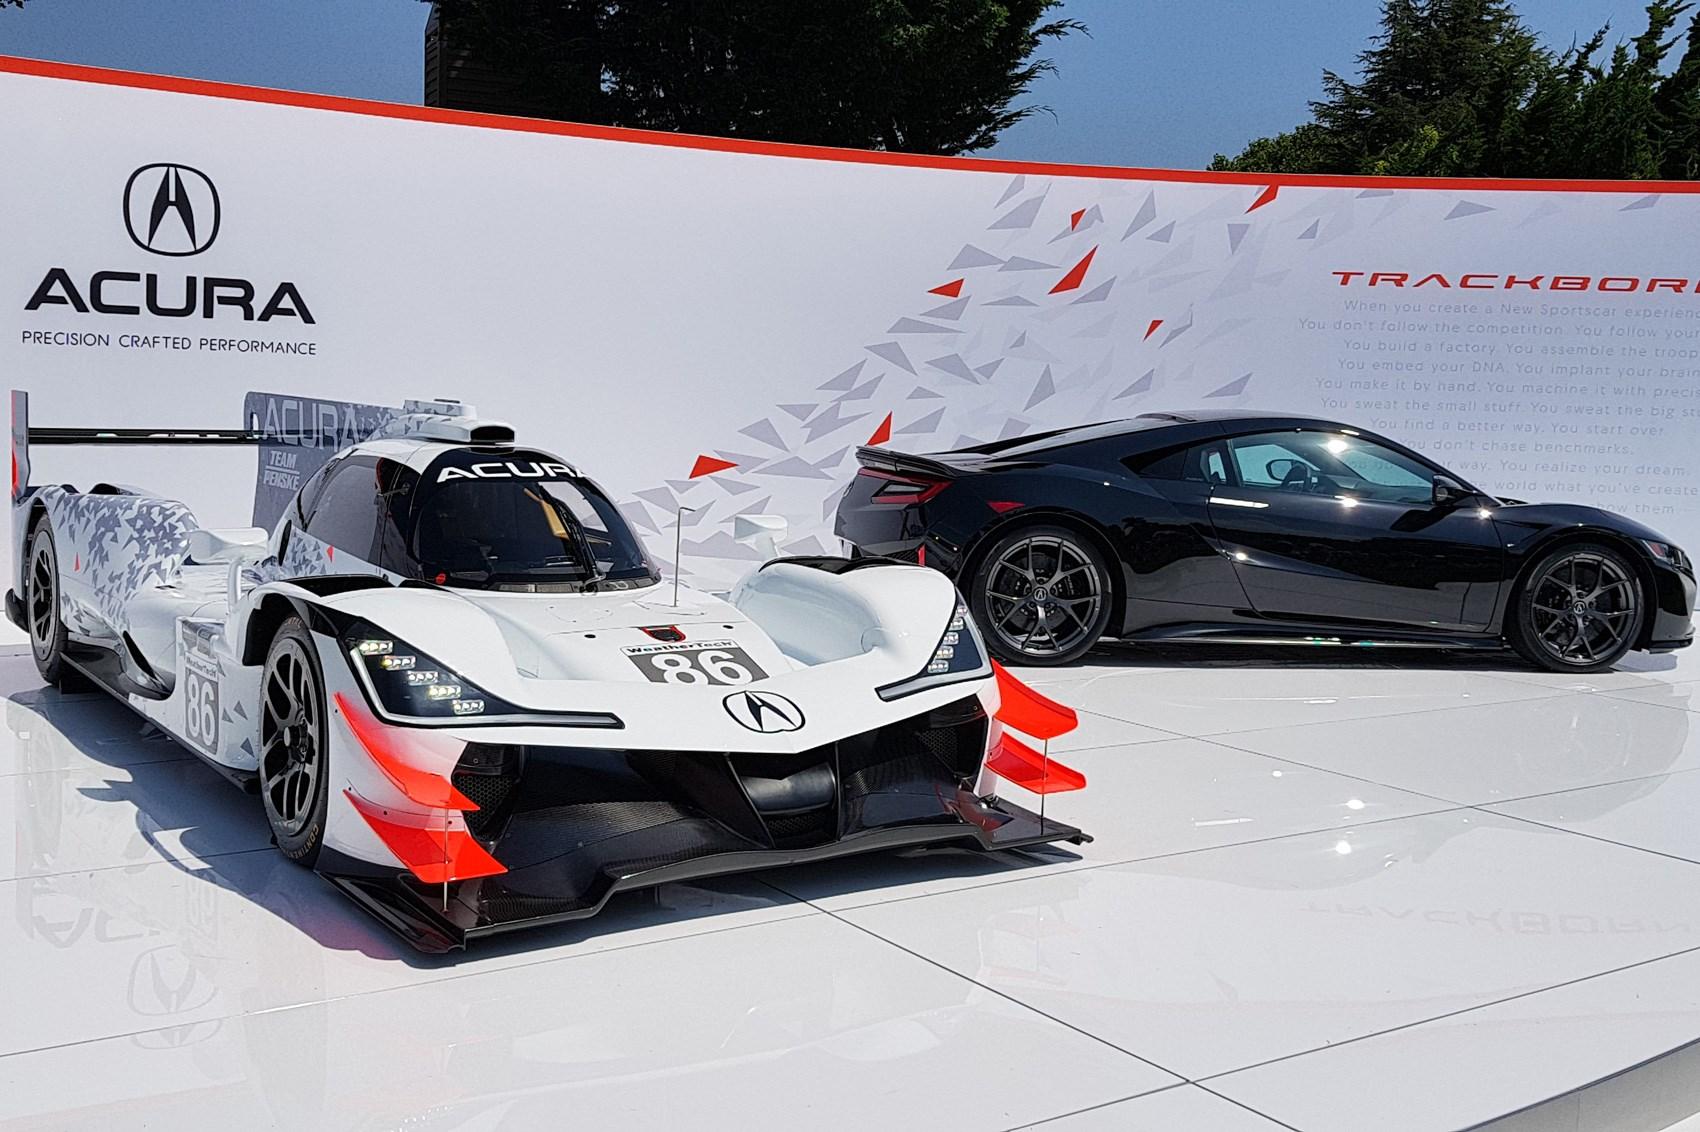 Acura Unveils New Arx 05 Racer At The Quail Car Magazine